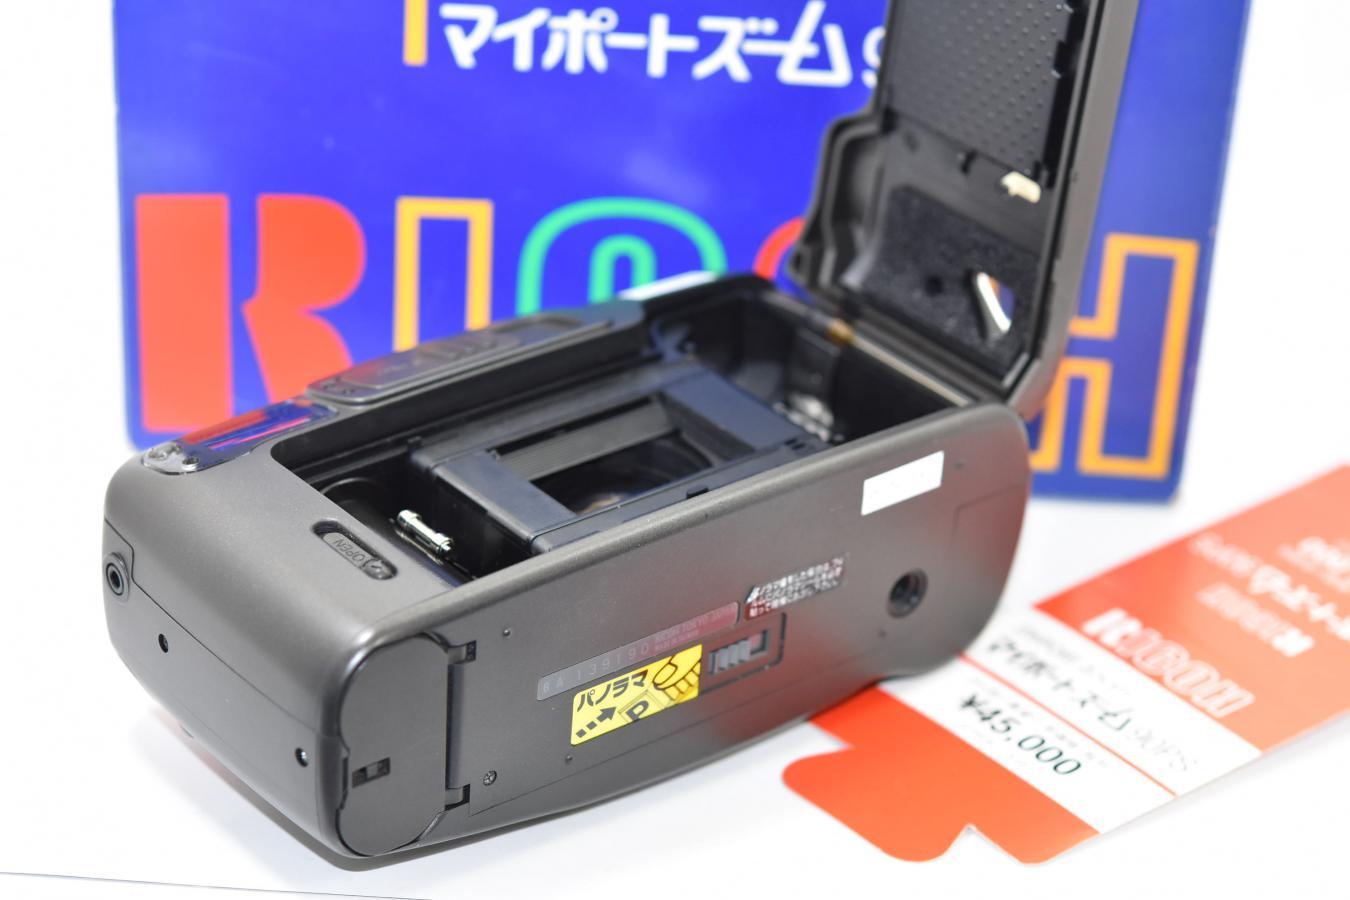 RICOH MYPORT ZOOM 90PS 元箱付 【RICOH ZOOM LENS 38-90mmMACRO搭載】